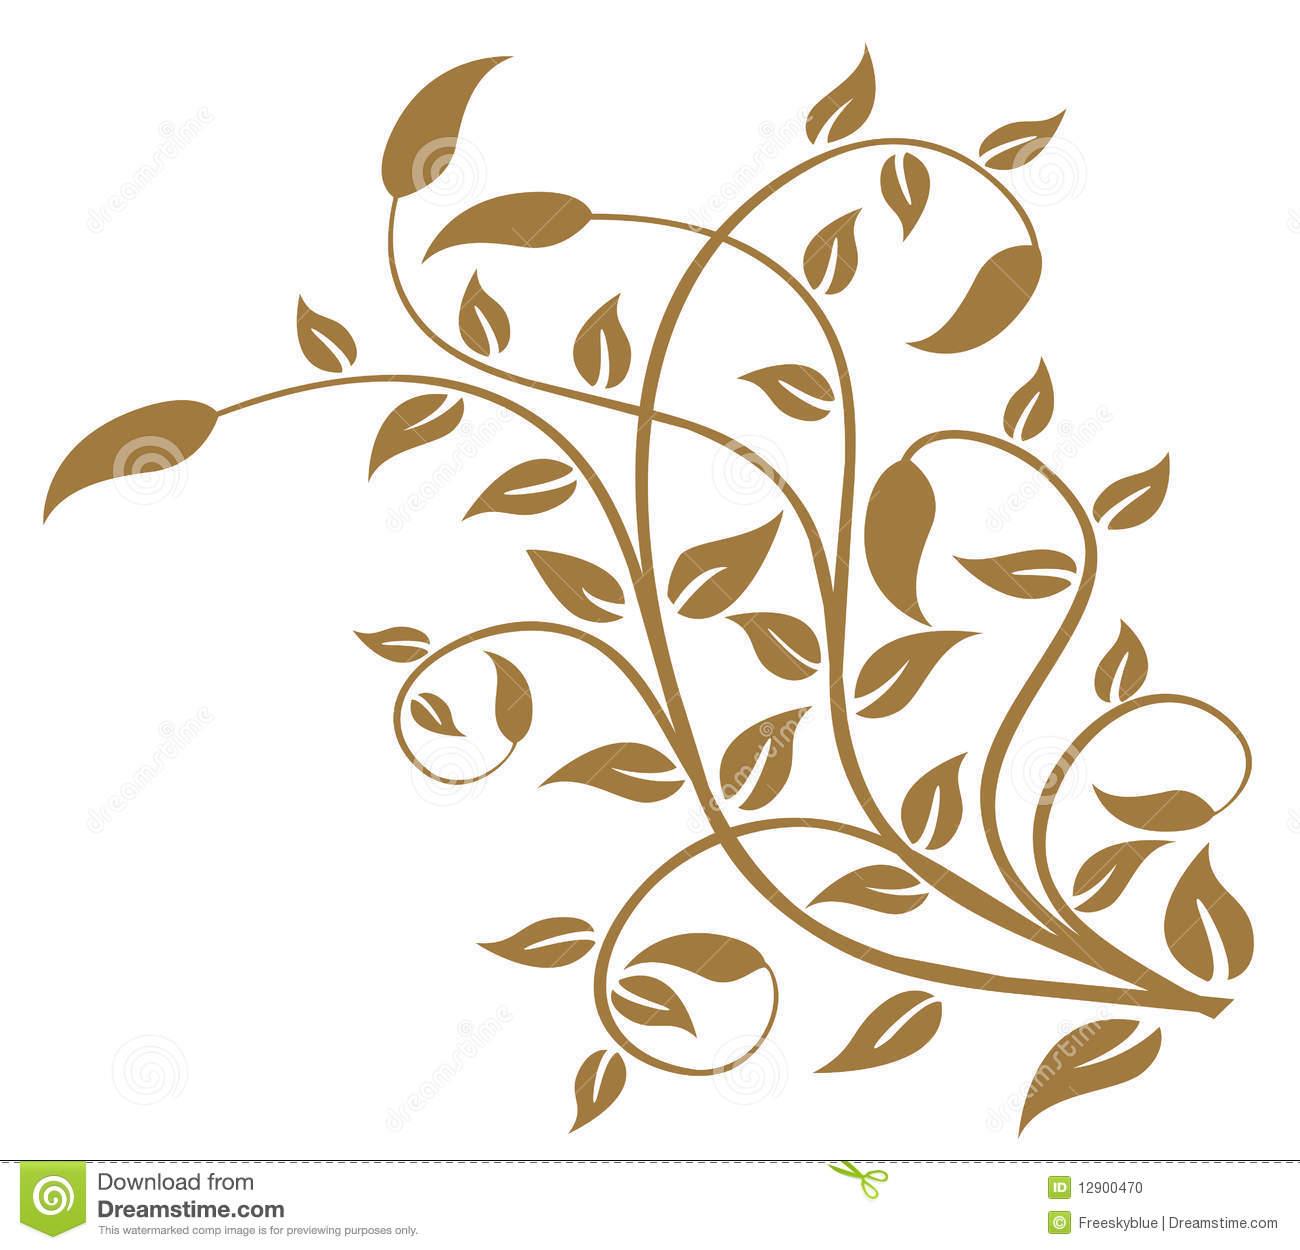 Drawn leaves vine leaf Of a of background allover